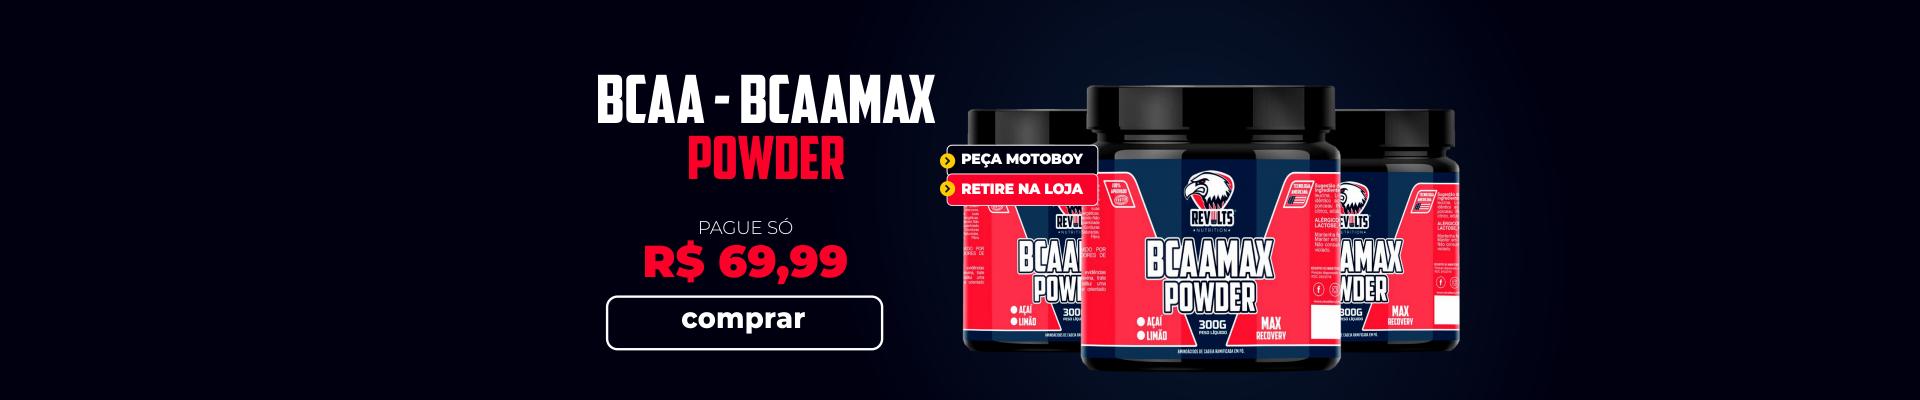 BCAA - BCAAMAX POWDER 300G - REVOLTS NUTRITION